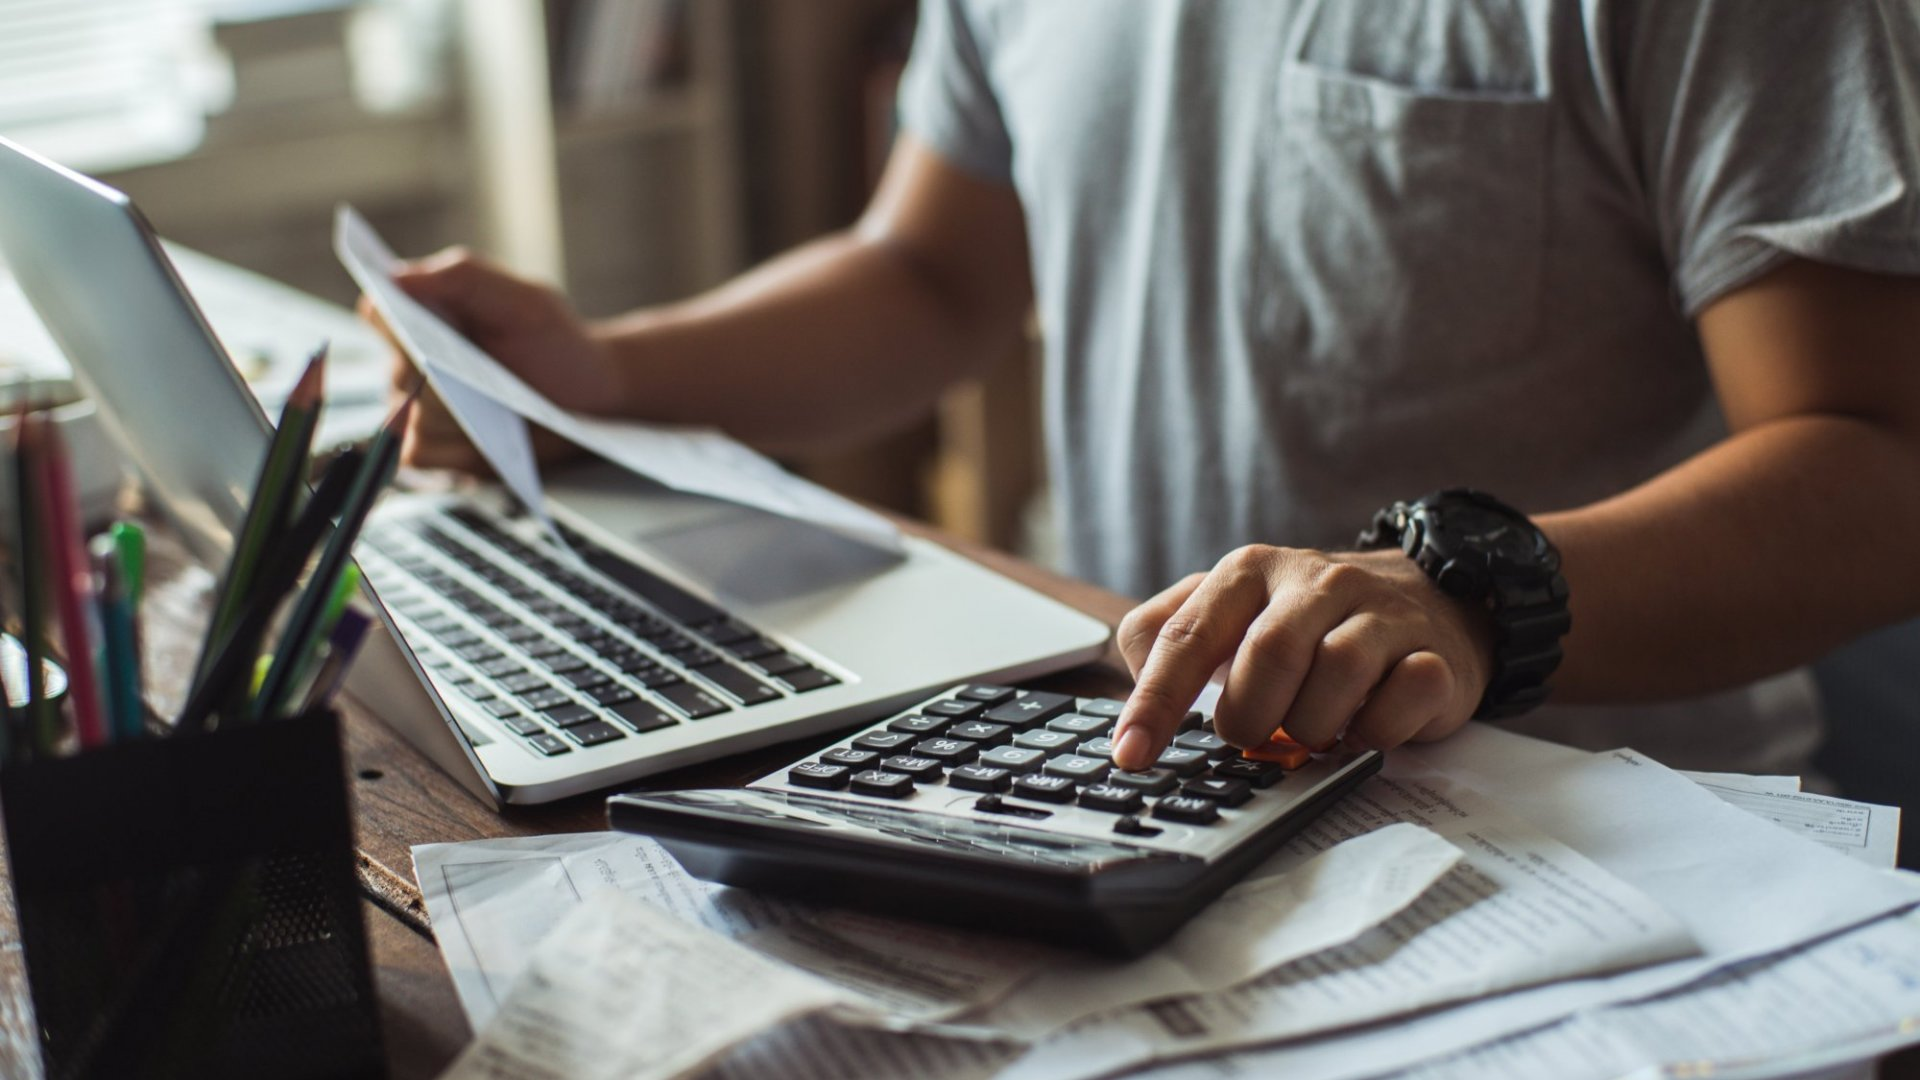 5 Personal Finance Tips If You Make an Irregular Income